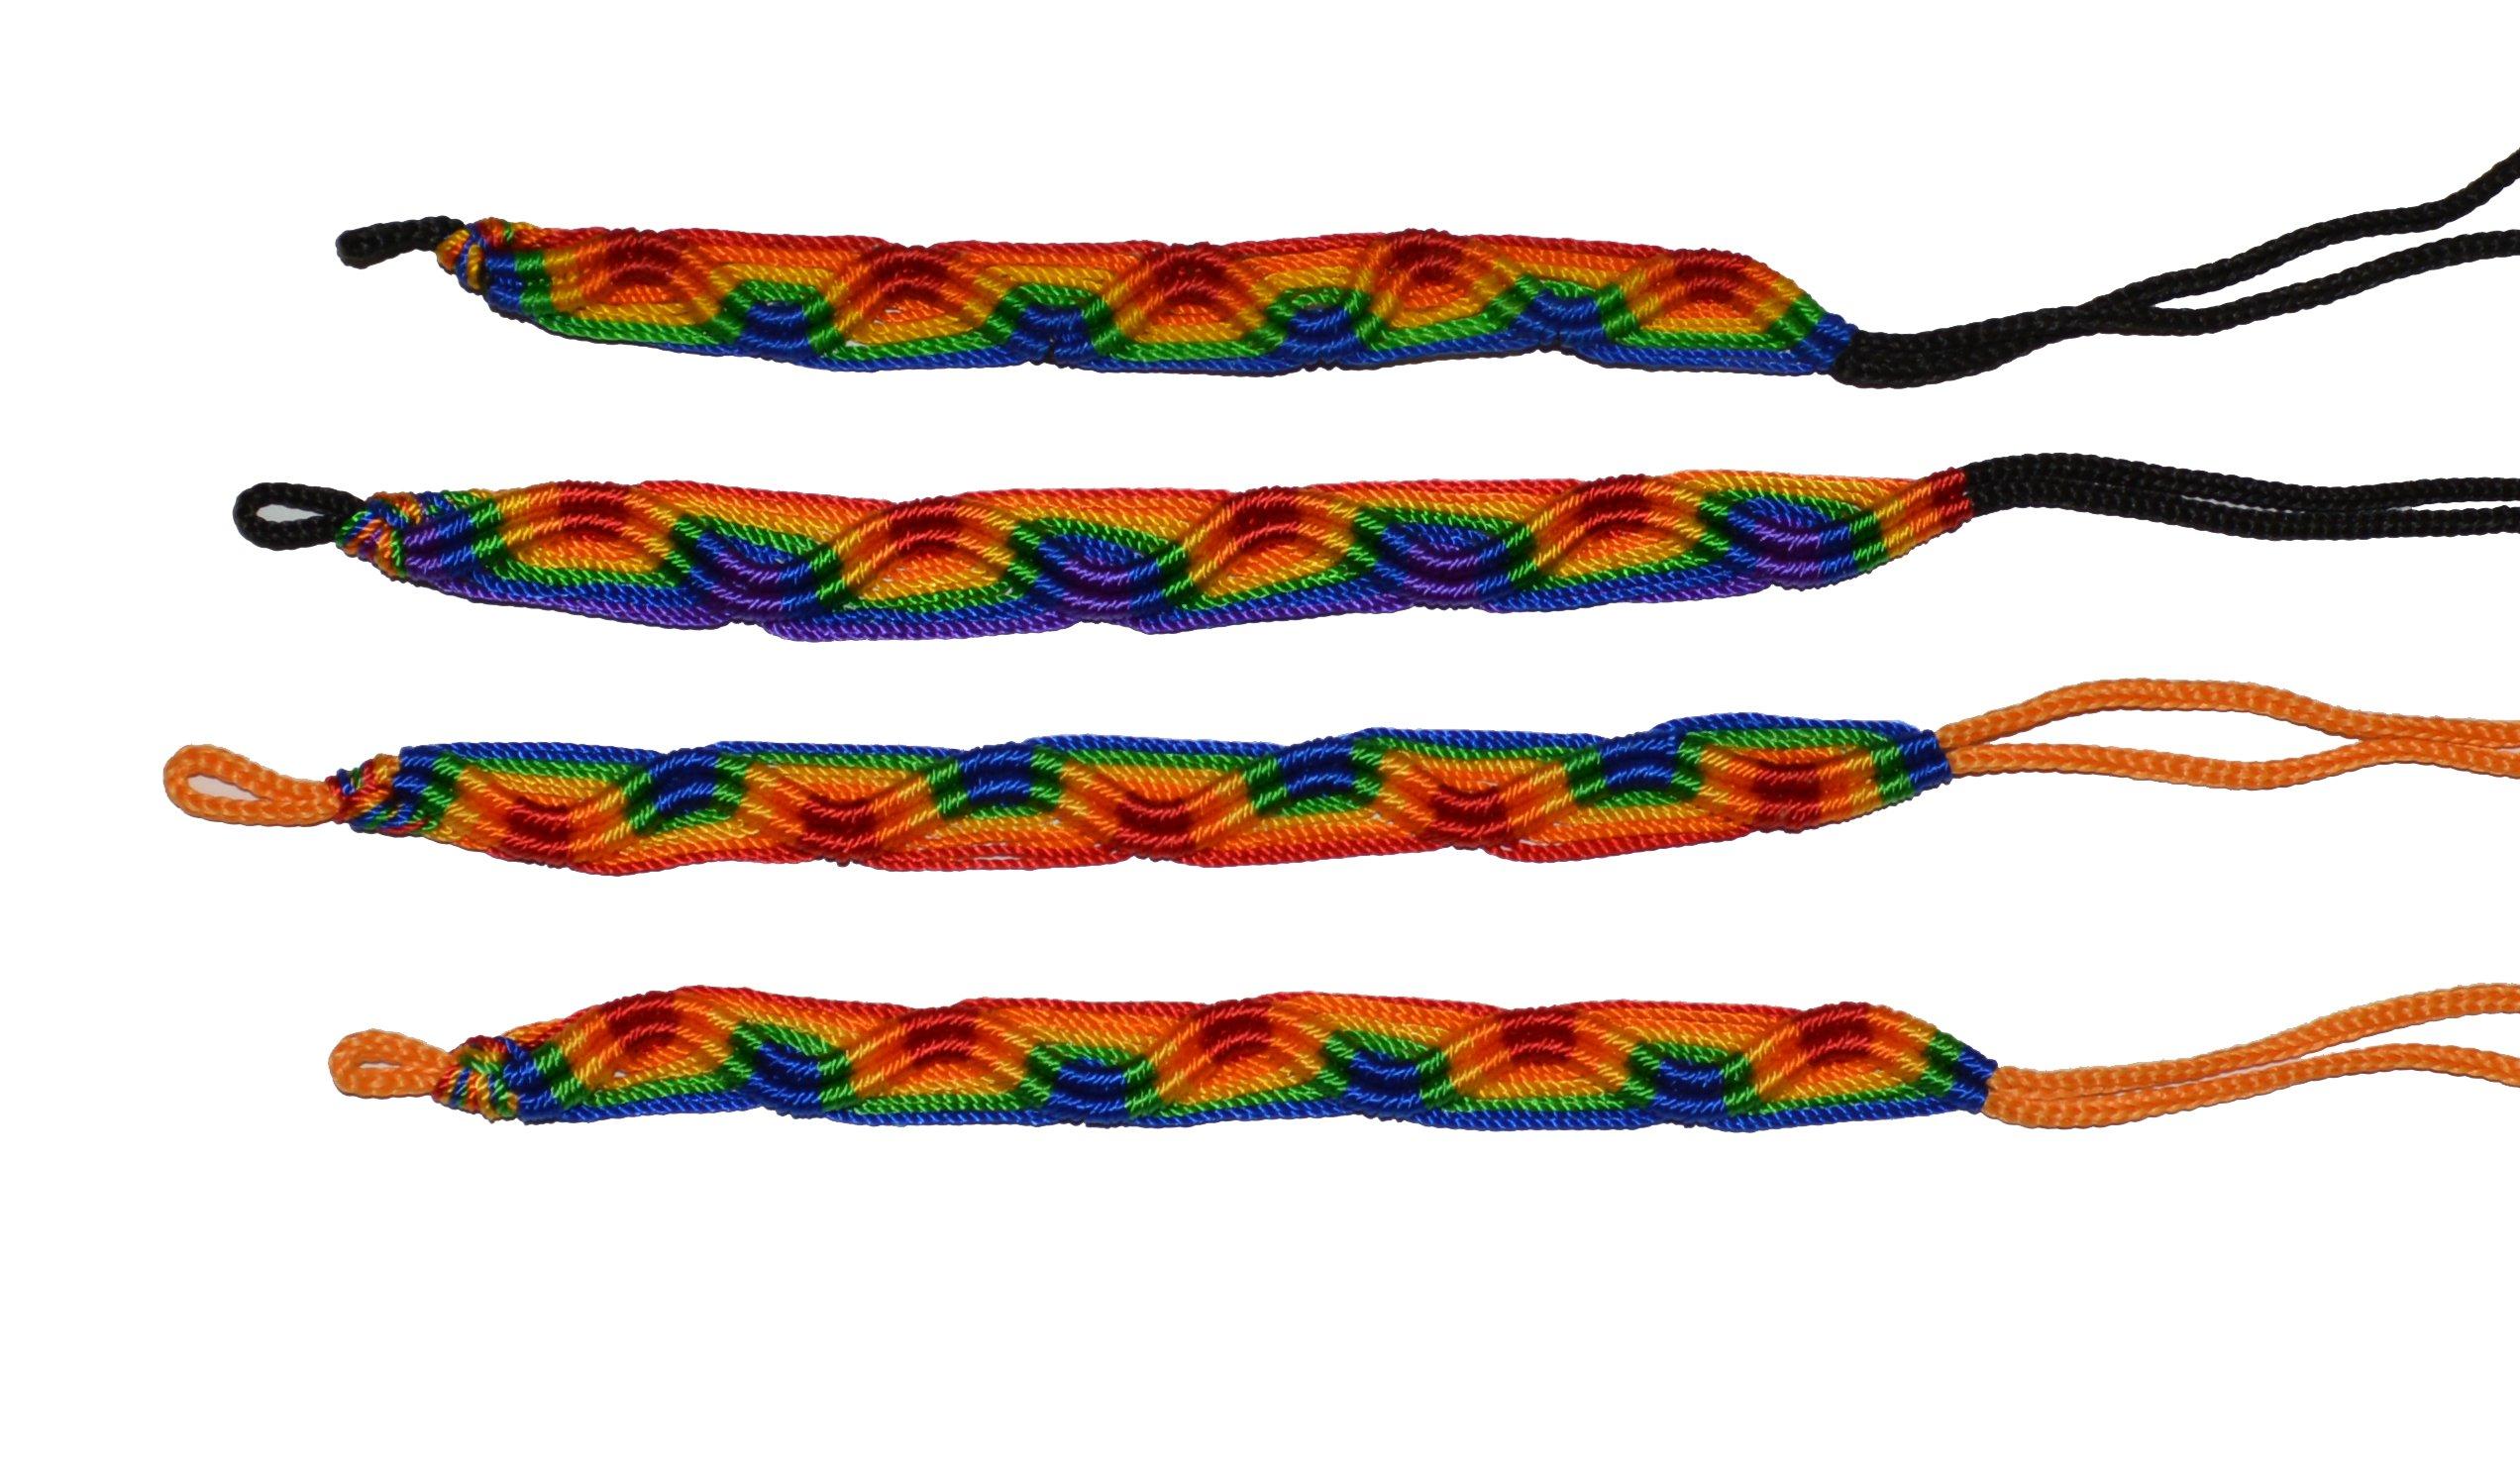 Rainbow Friendship Bracelets LOT 100 MIX From Peru Wholesale GAY Lesbian Pride by Handmade In Peru (Image #5)